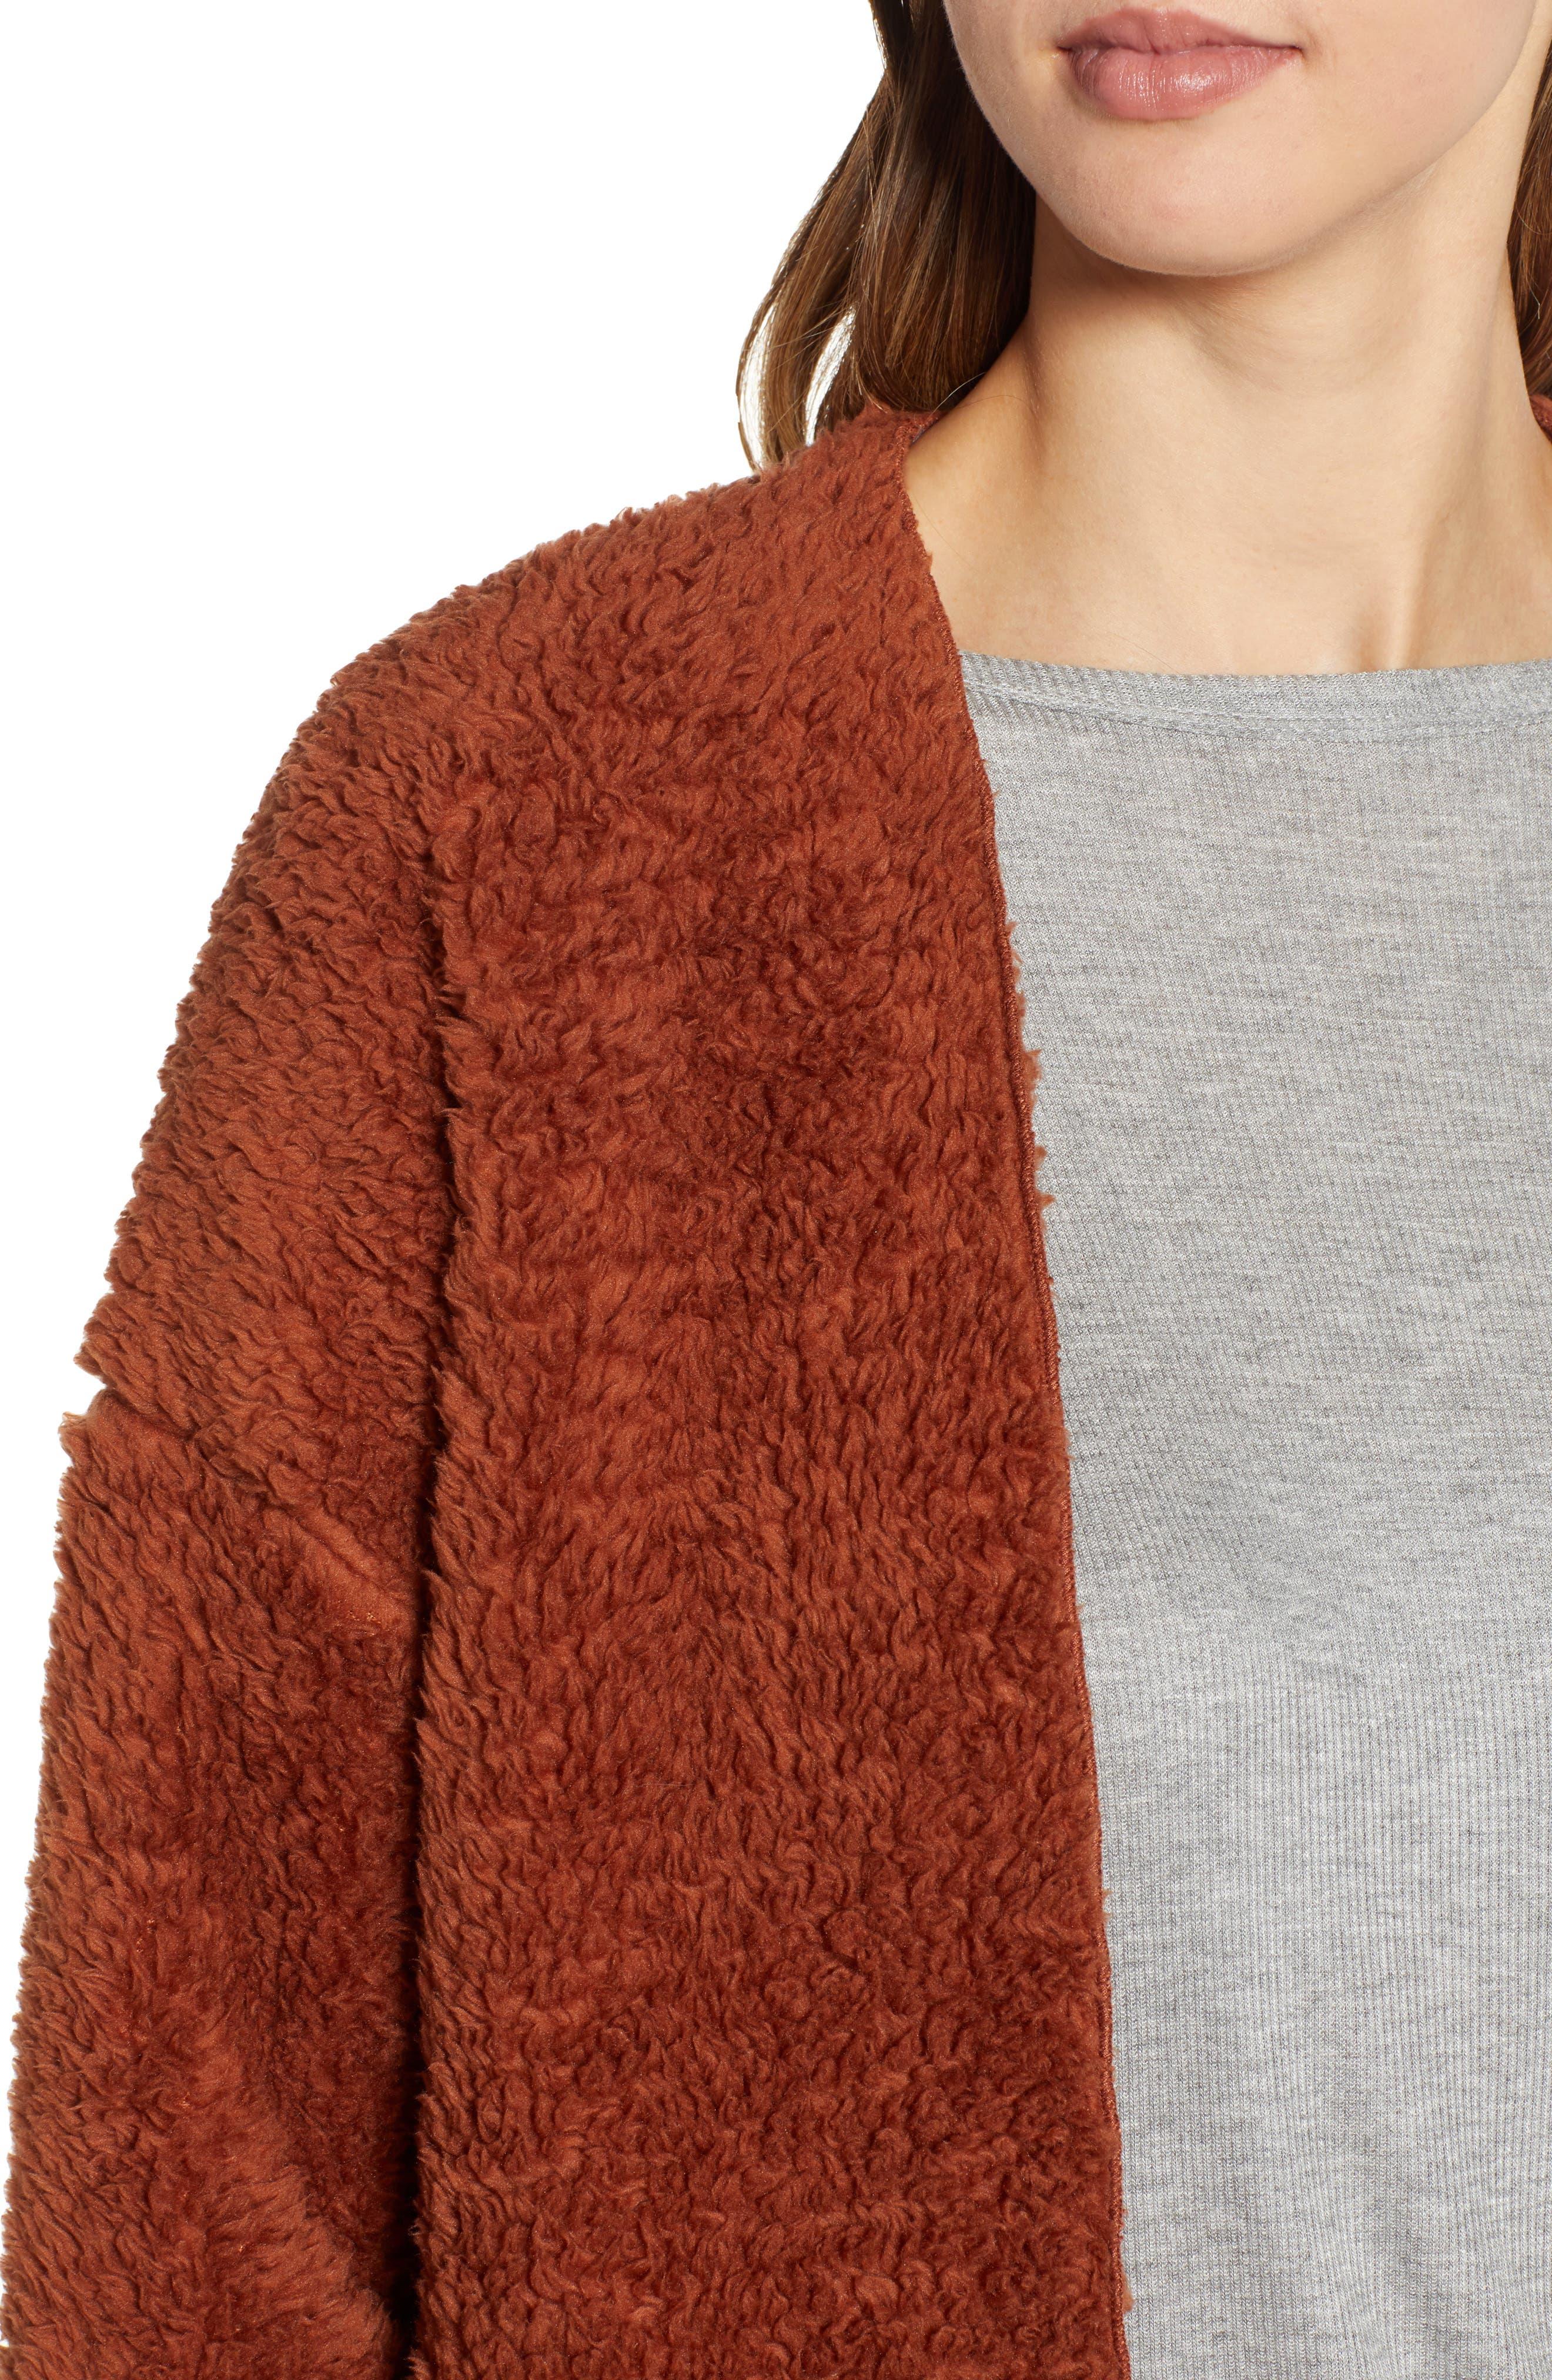 SOCIALITE, Cozy High Pile Fleece Jacket, Alternate thumbnail 5, color, 200